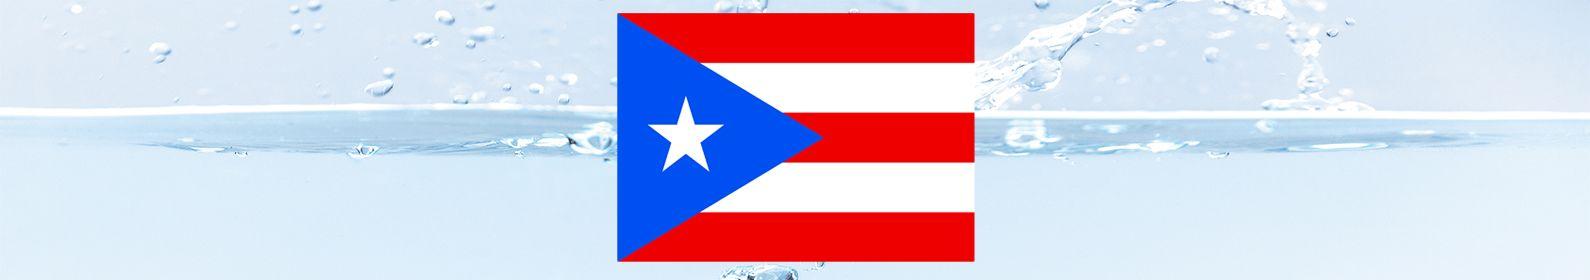 water-treatment-puerto-rico.jpg